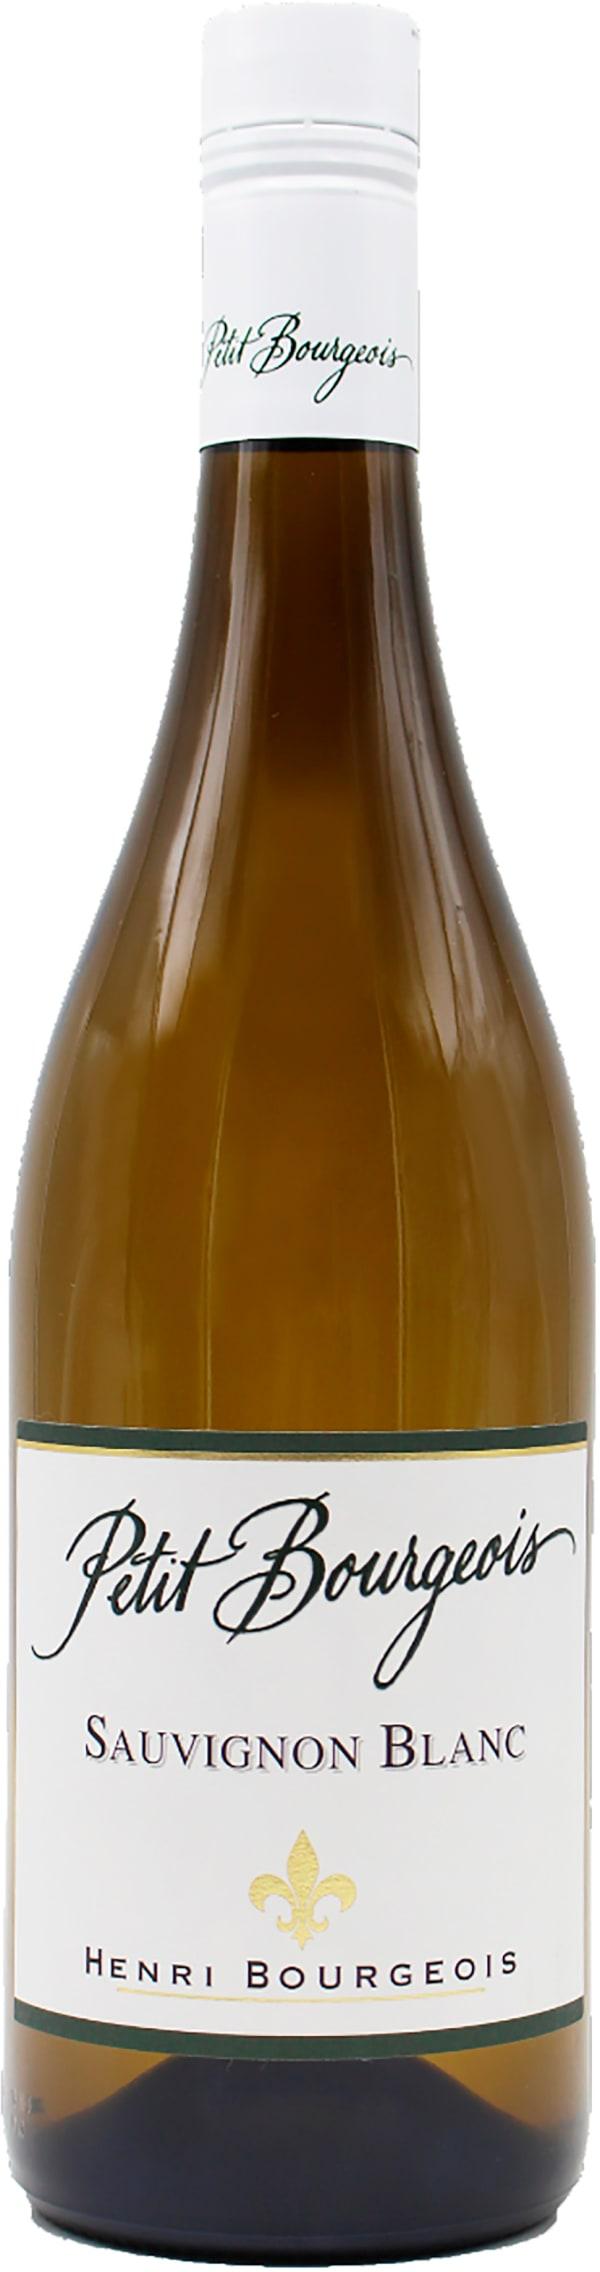 Petit Bourgeois Sauvignon Blanc 2018